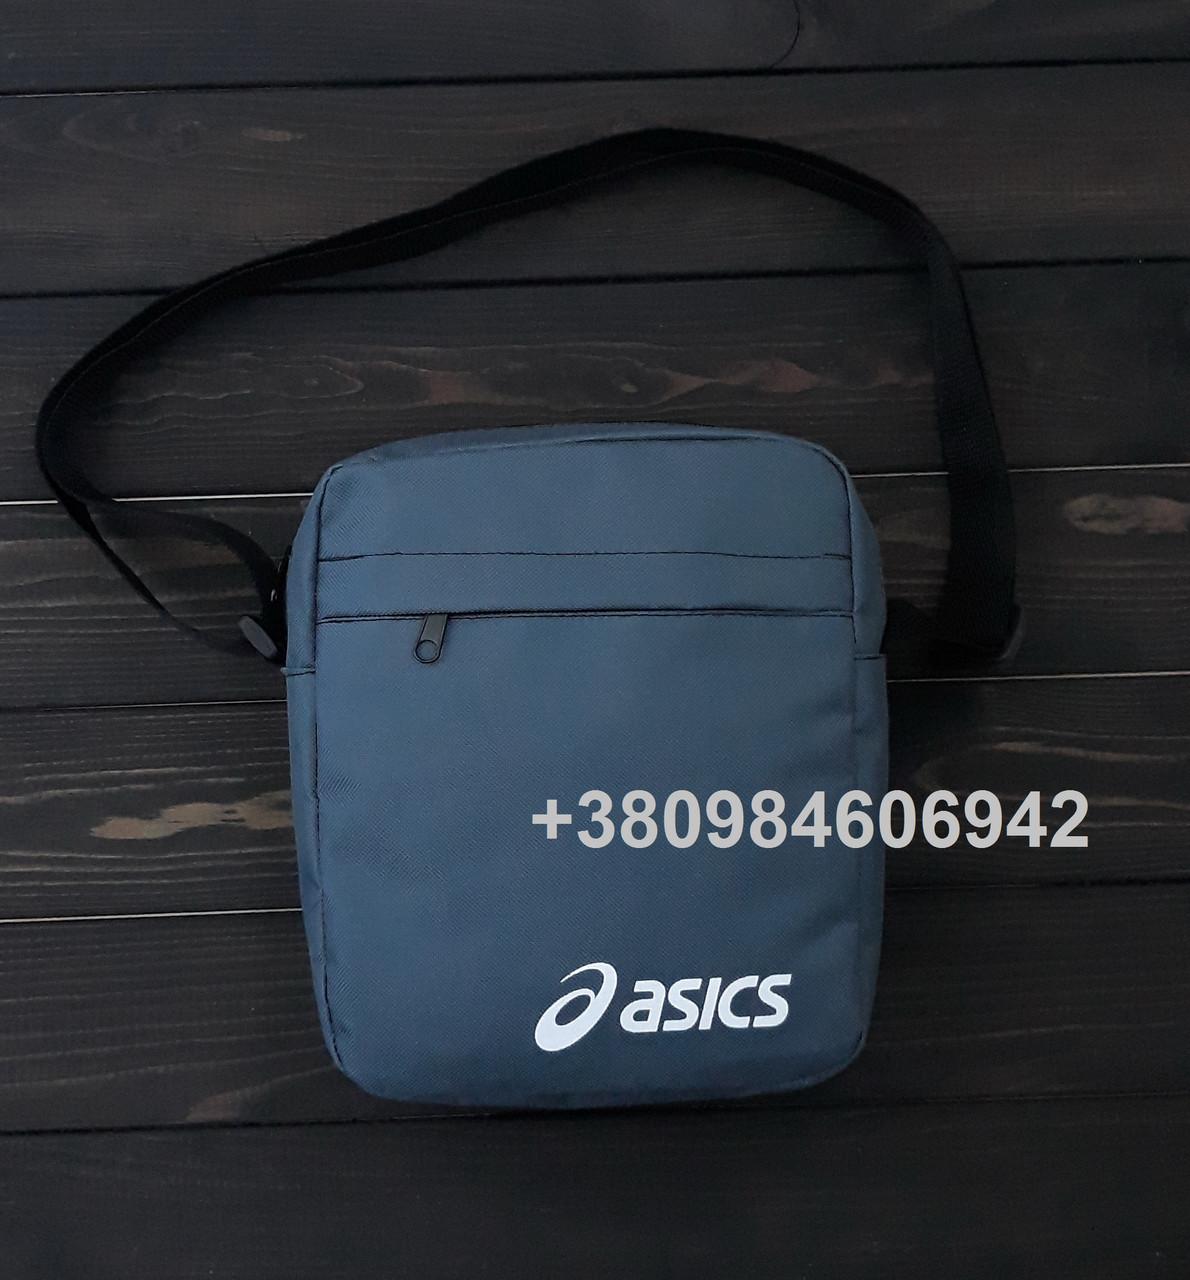 7d6b64ba64e2 Опт. Сумка на плечо Nike, Asics. Мужская Барсетка: продажа, цена в ...